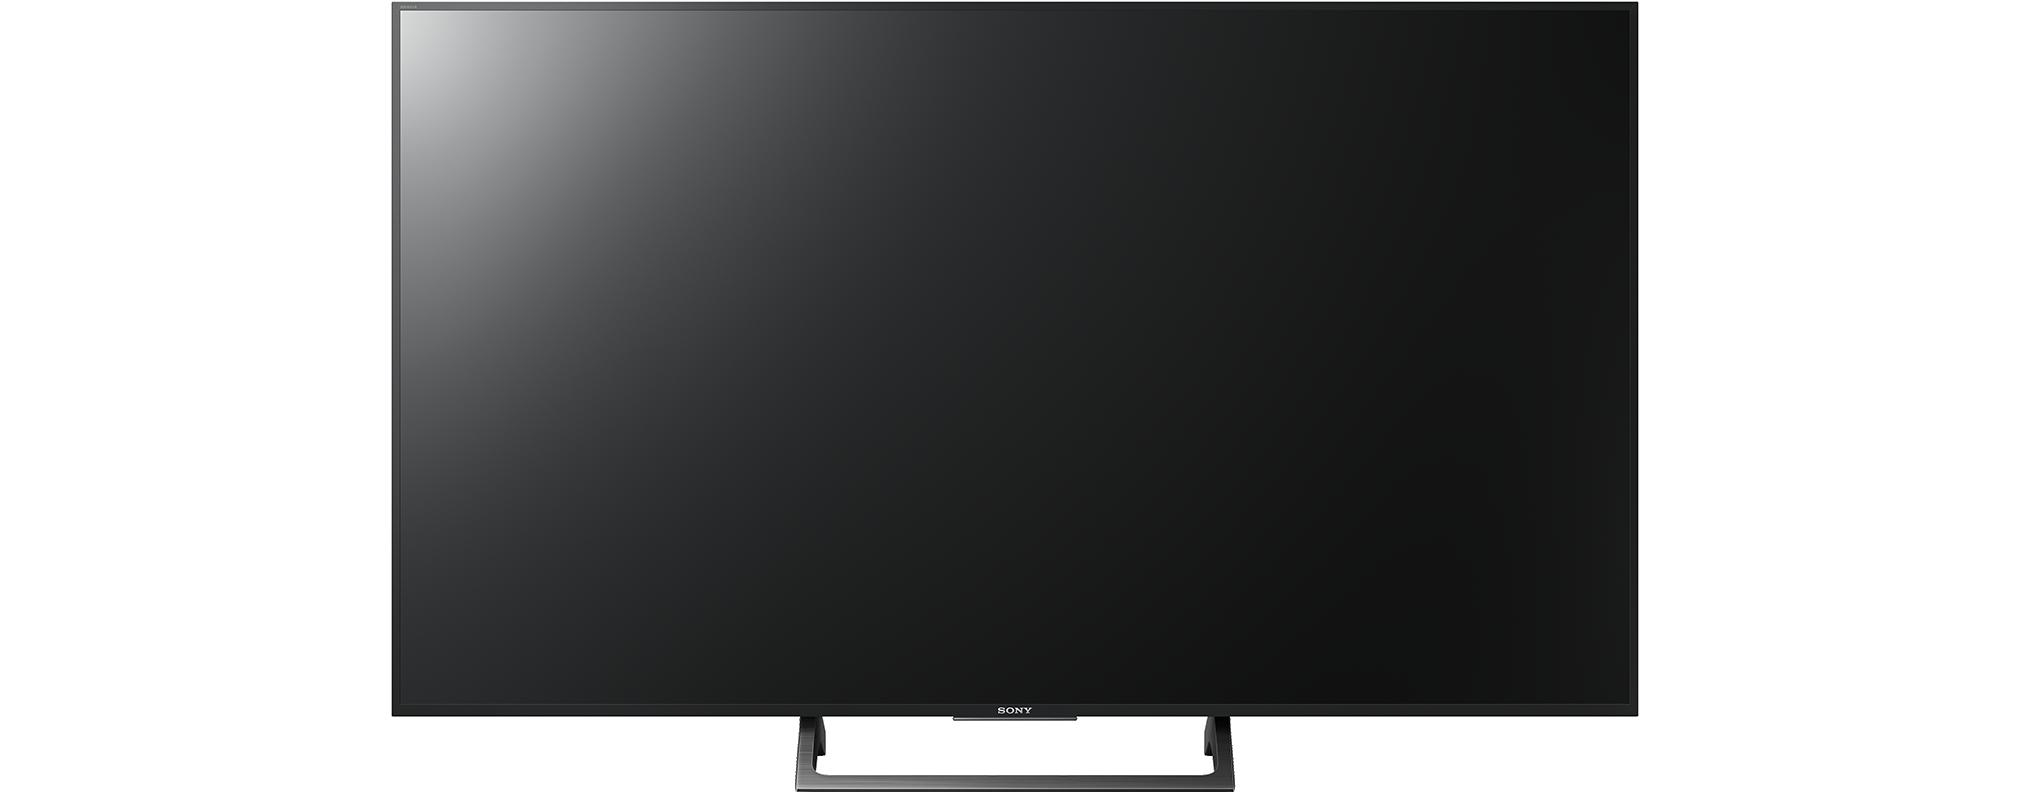 sony tv harvey norman. image gallery. \u2039 \u203a sony tv harvey norman